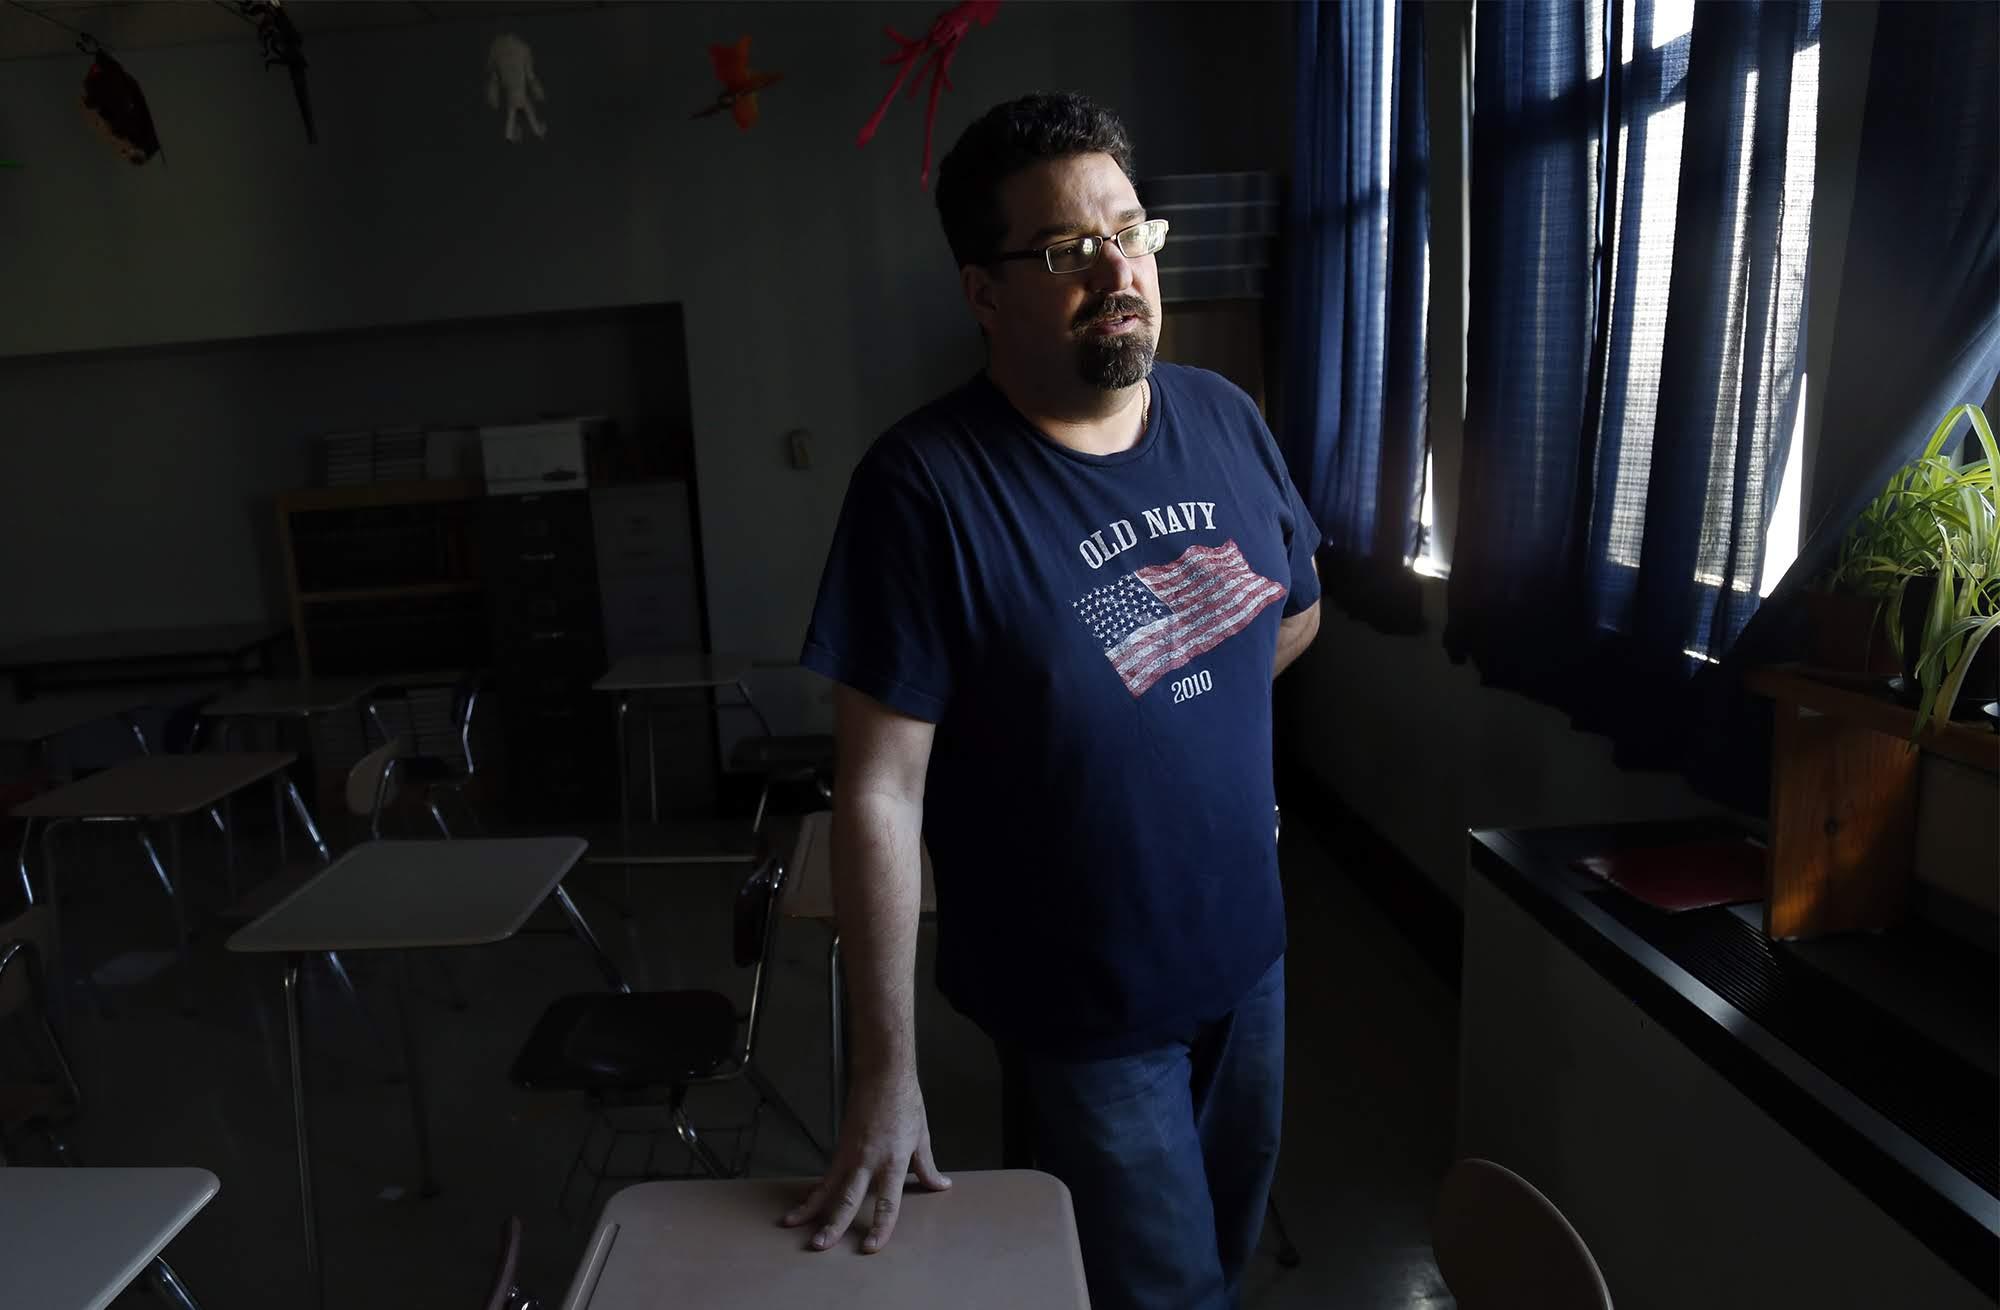 Ken Lex, language arts teacher at Sto-Rox Junior-Senior High School.